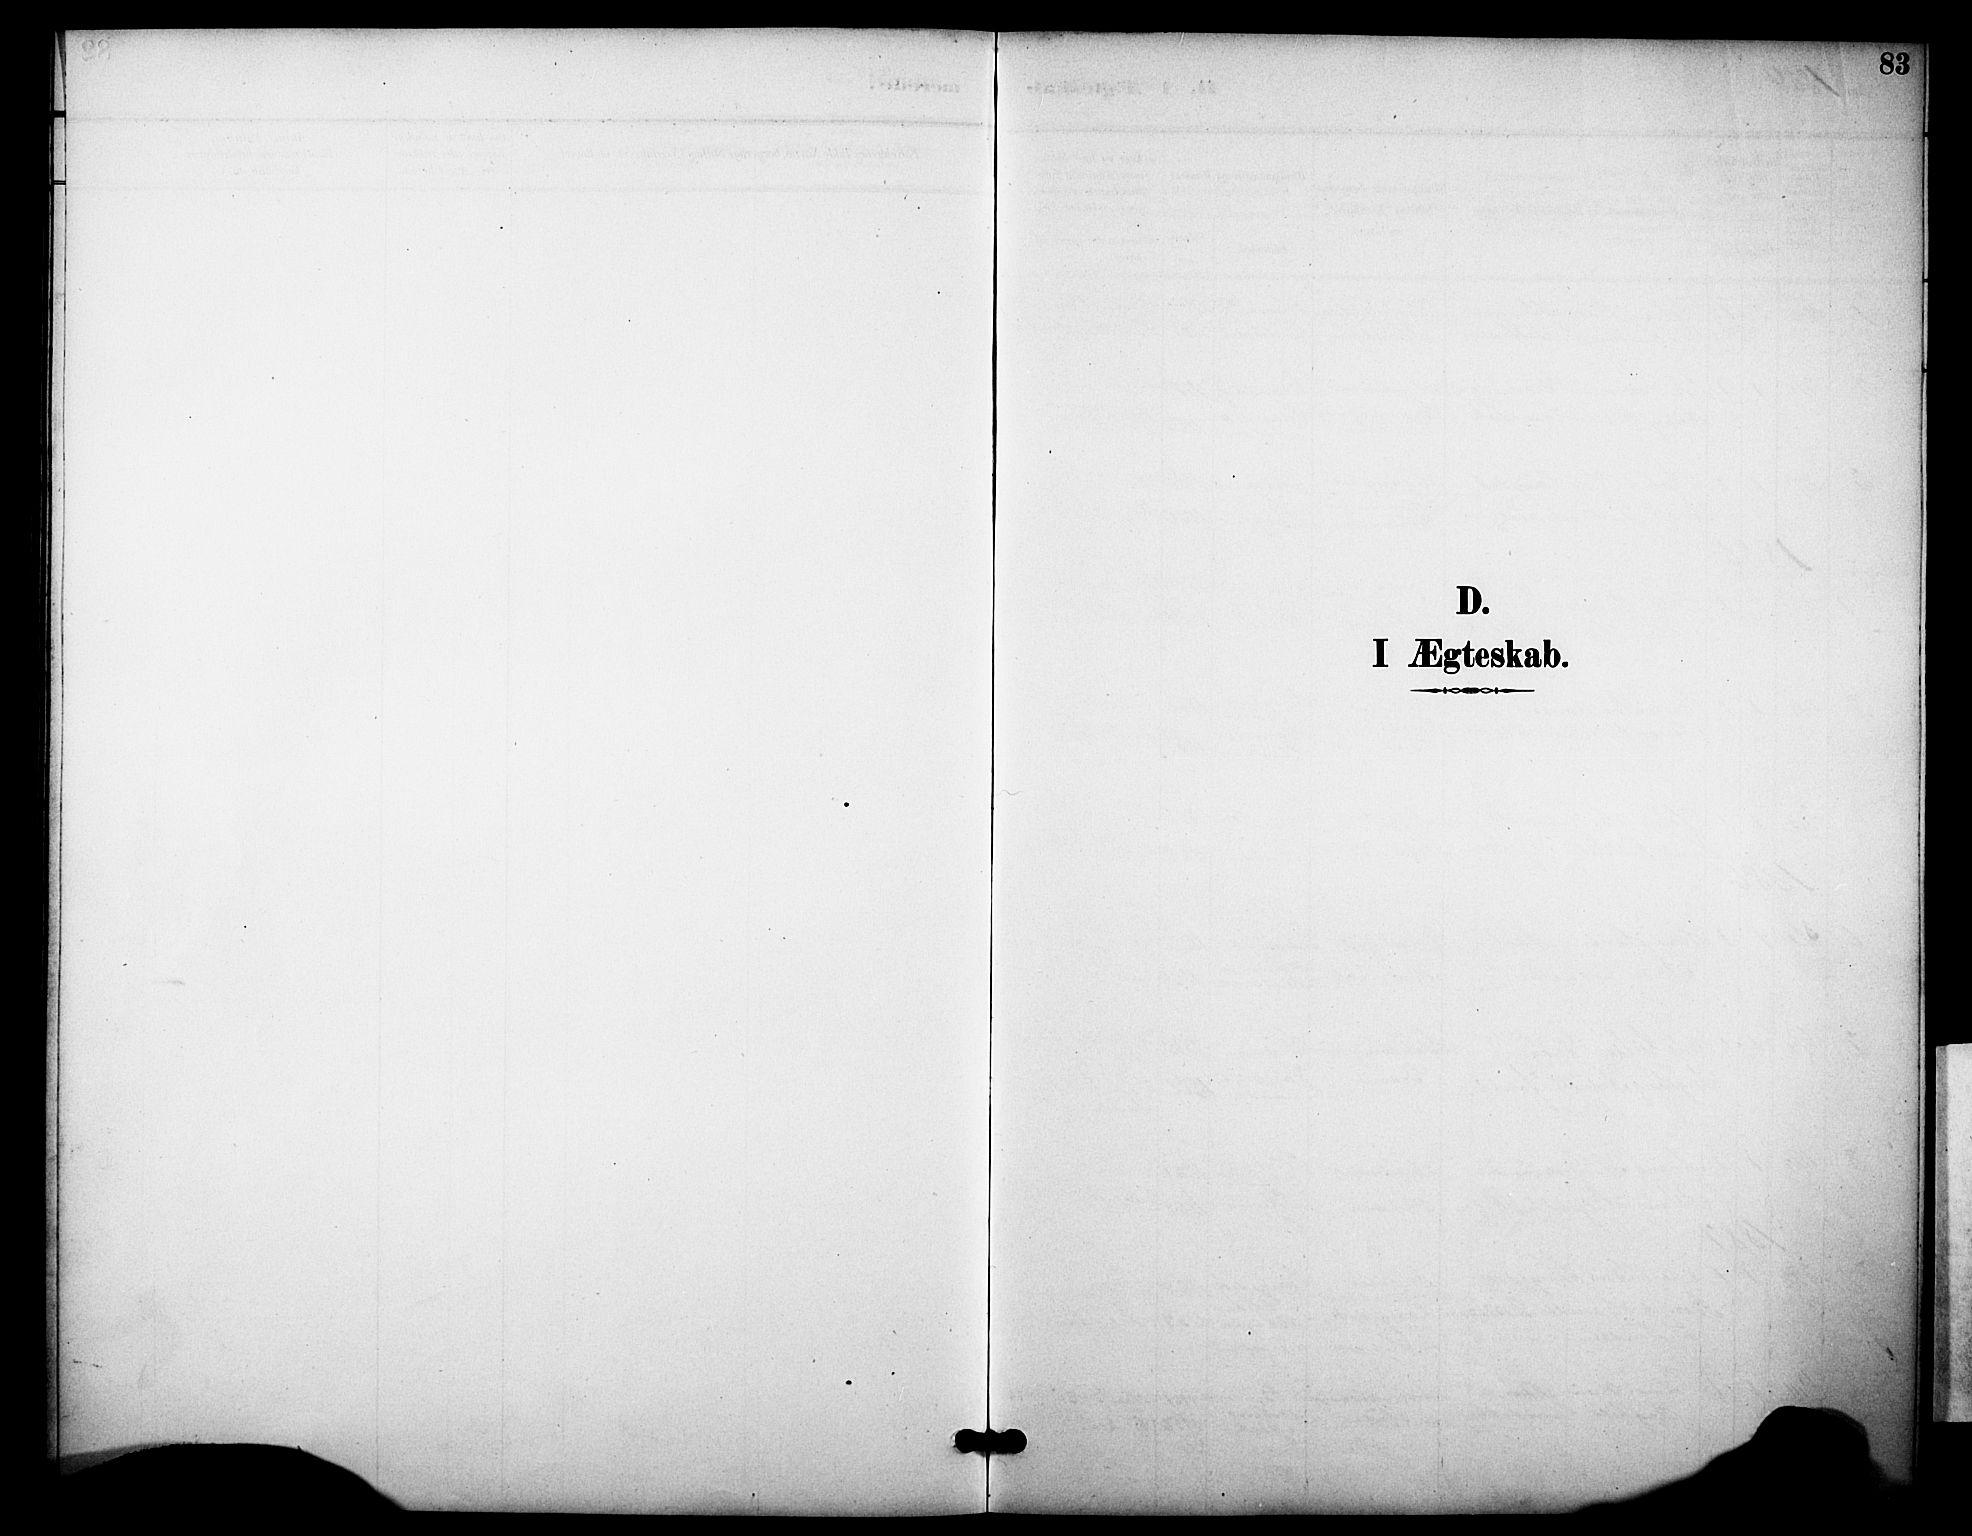 SAKO, Heddal kirkebøker, F/Fb/L0001: Ministerialbok nr. II 1, 1884-1910, s. 83